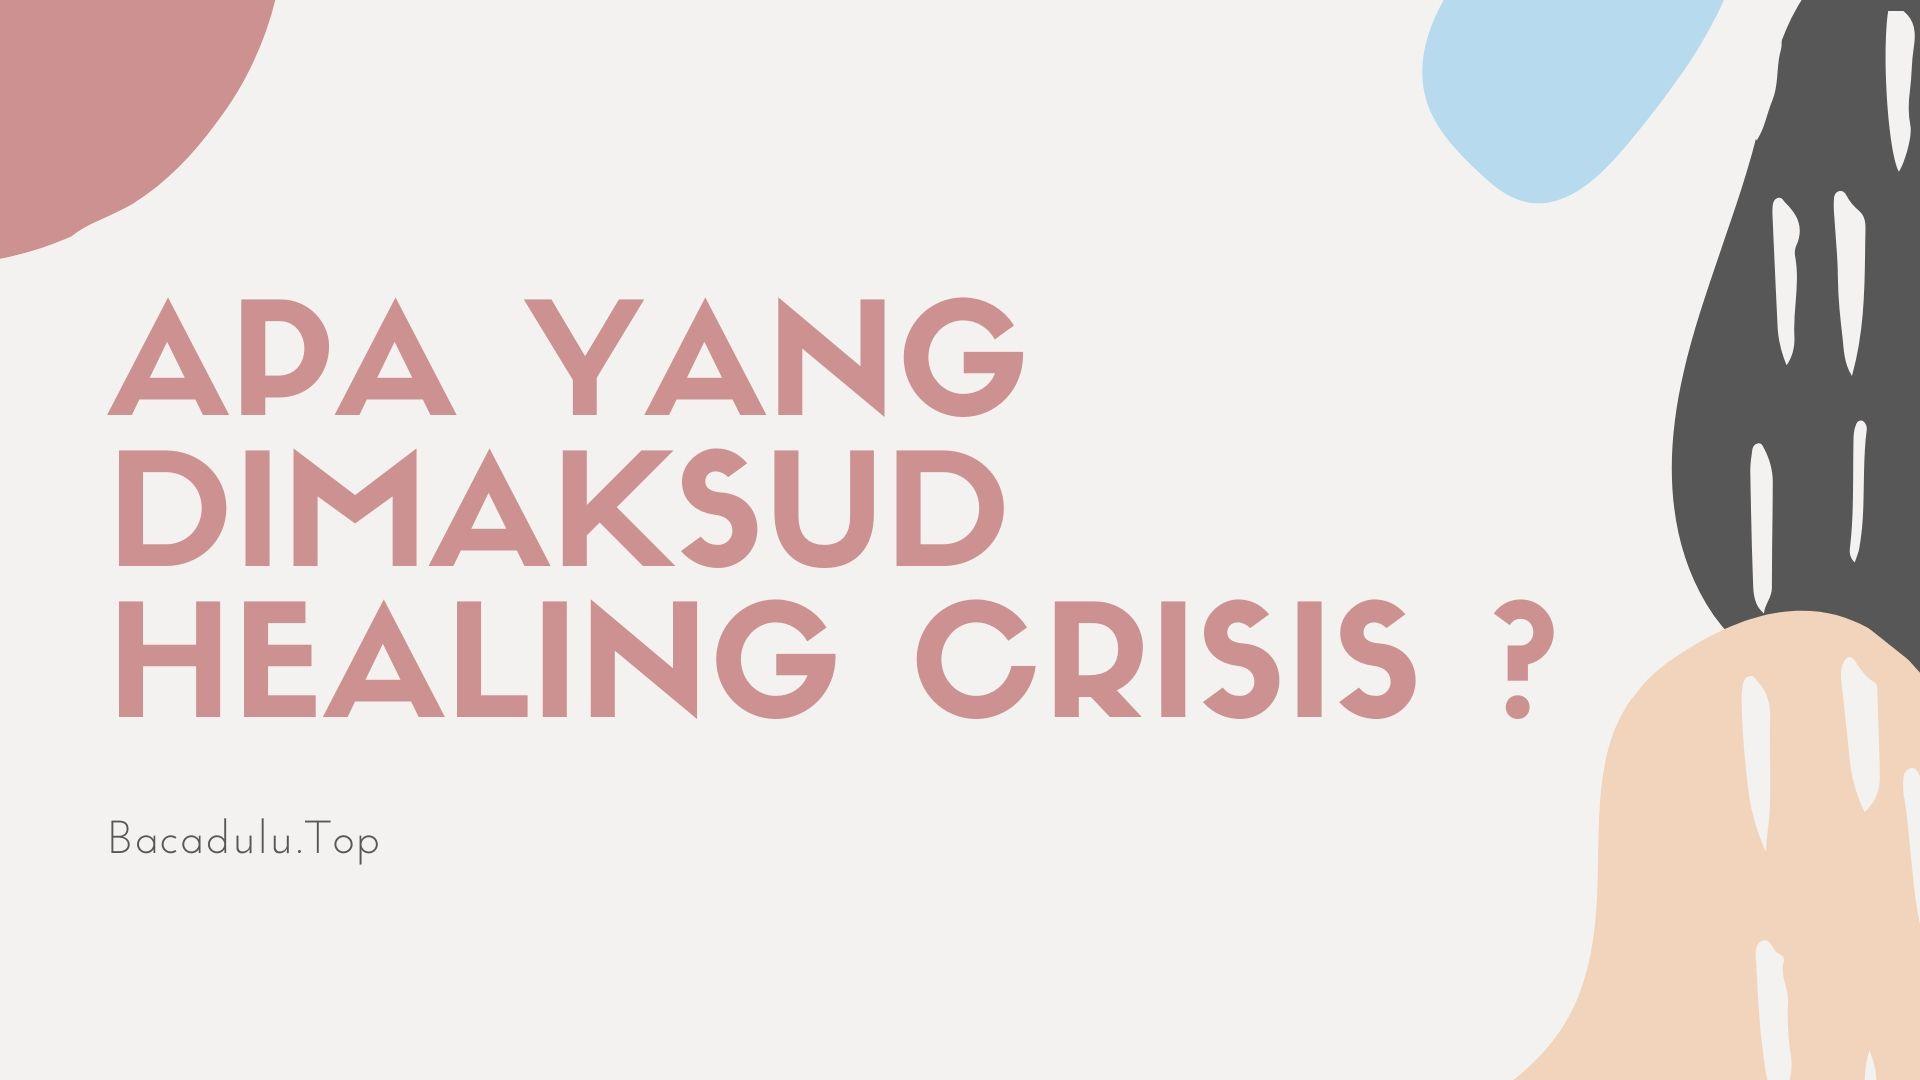 Apa Yang Dimaksud Healing Crisis ? Ini Dia Penjelasan Lengkapnya